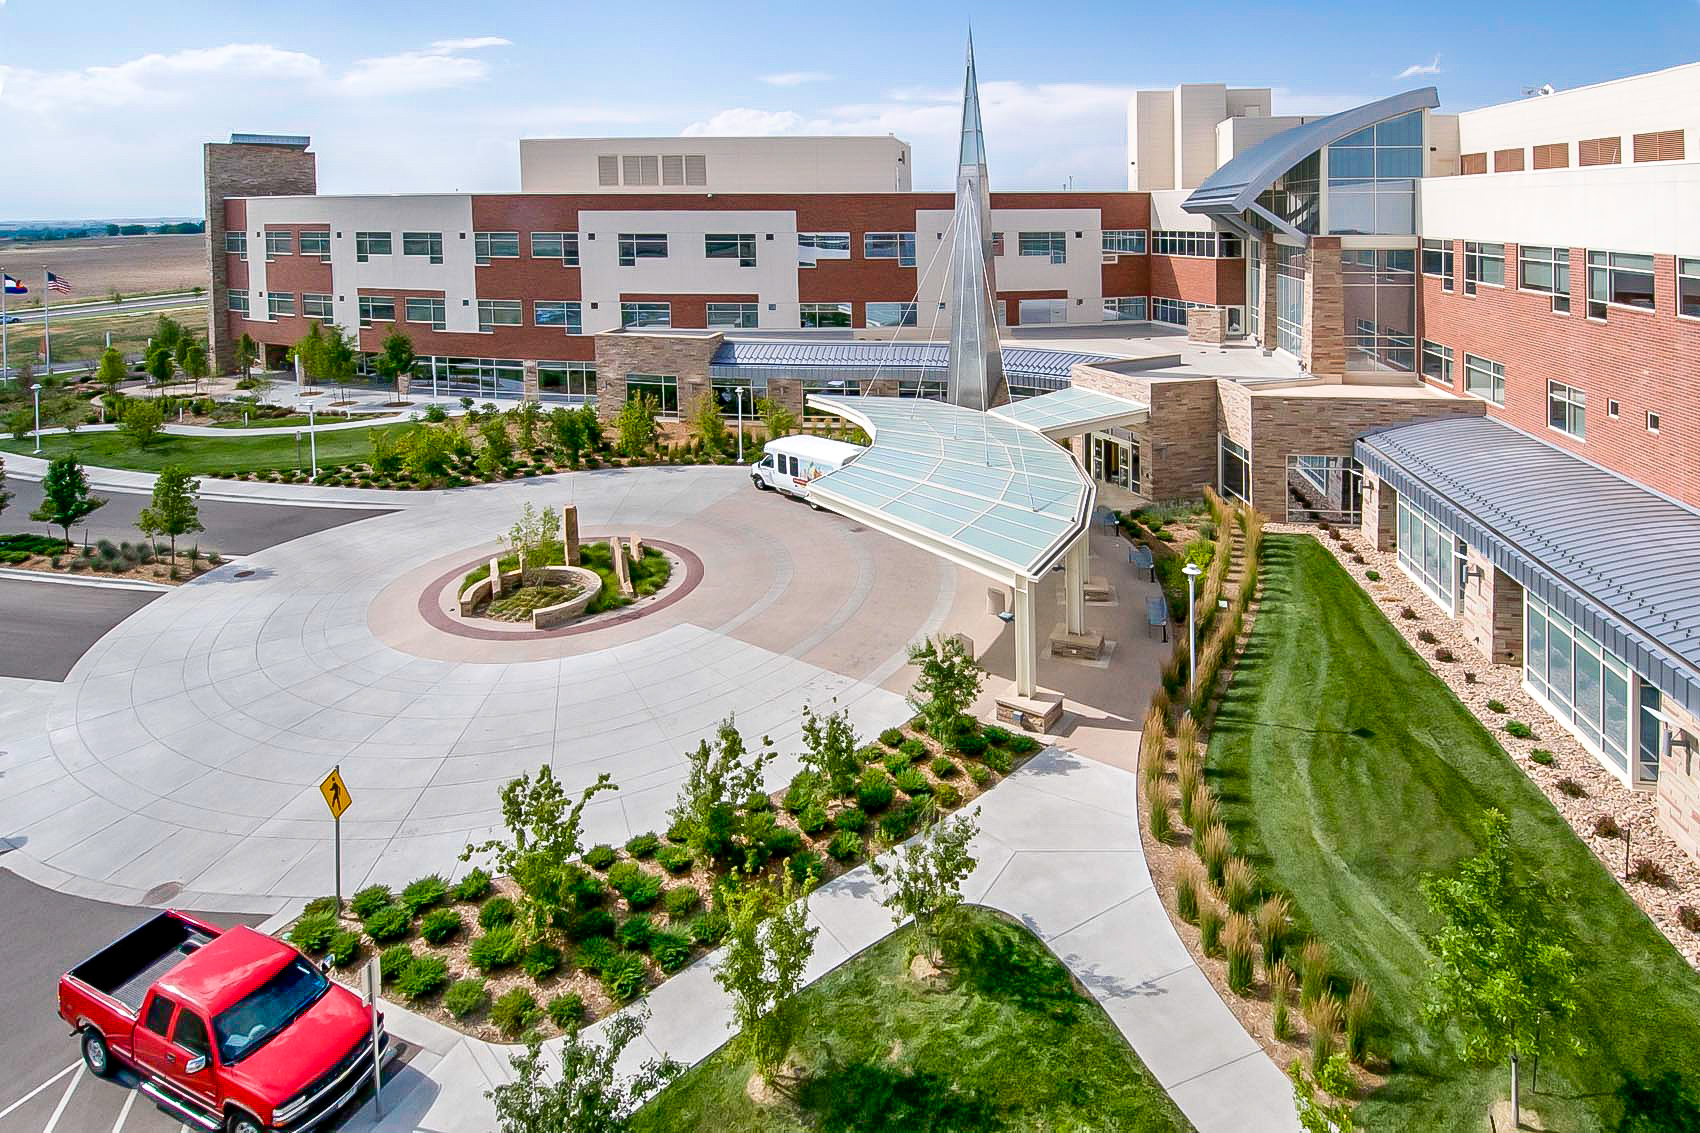 "<img src="" studioINSITE_Platte_Valley_Medical_Center_Drop_Off_Plaza ""alt=""Healing Garden, Medical Campus, Master Plan, Landscape Architecture, Brighton Colorado, Therapeutic Gardens  "" title=""Platte Valley Medical Center""/>"